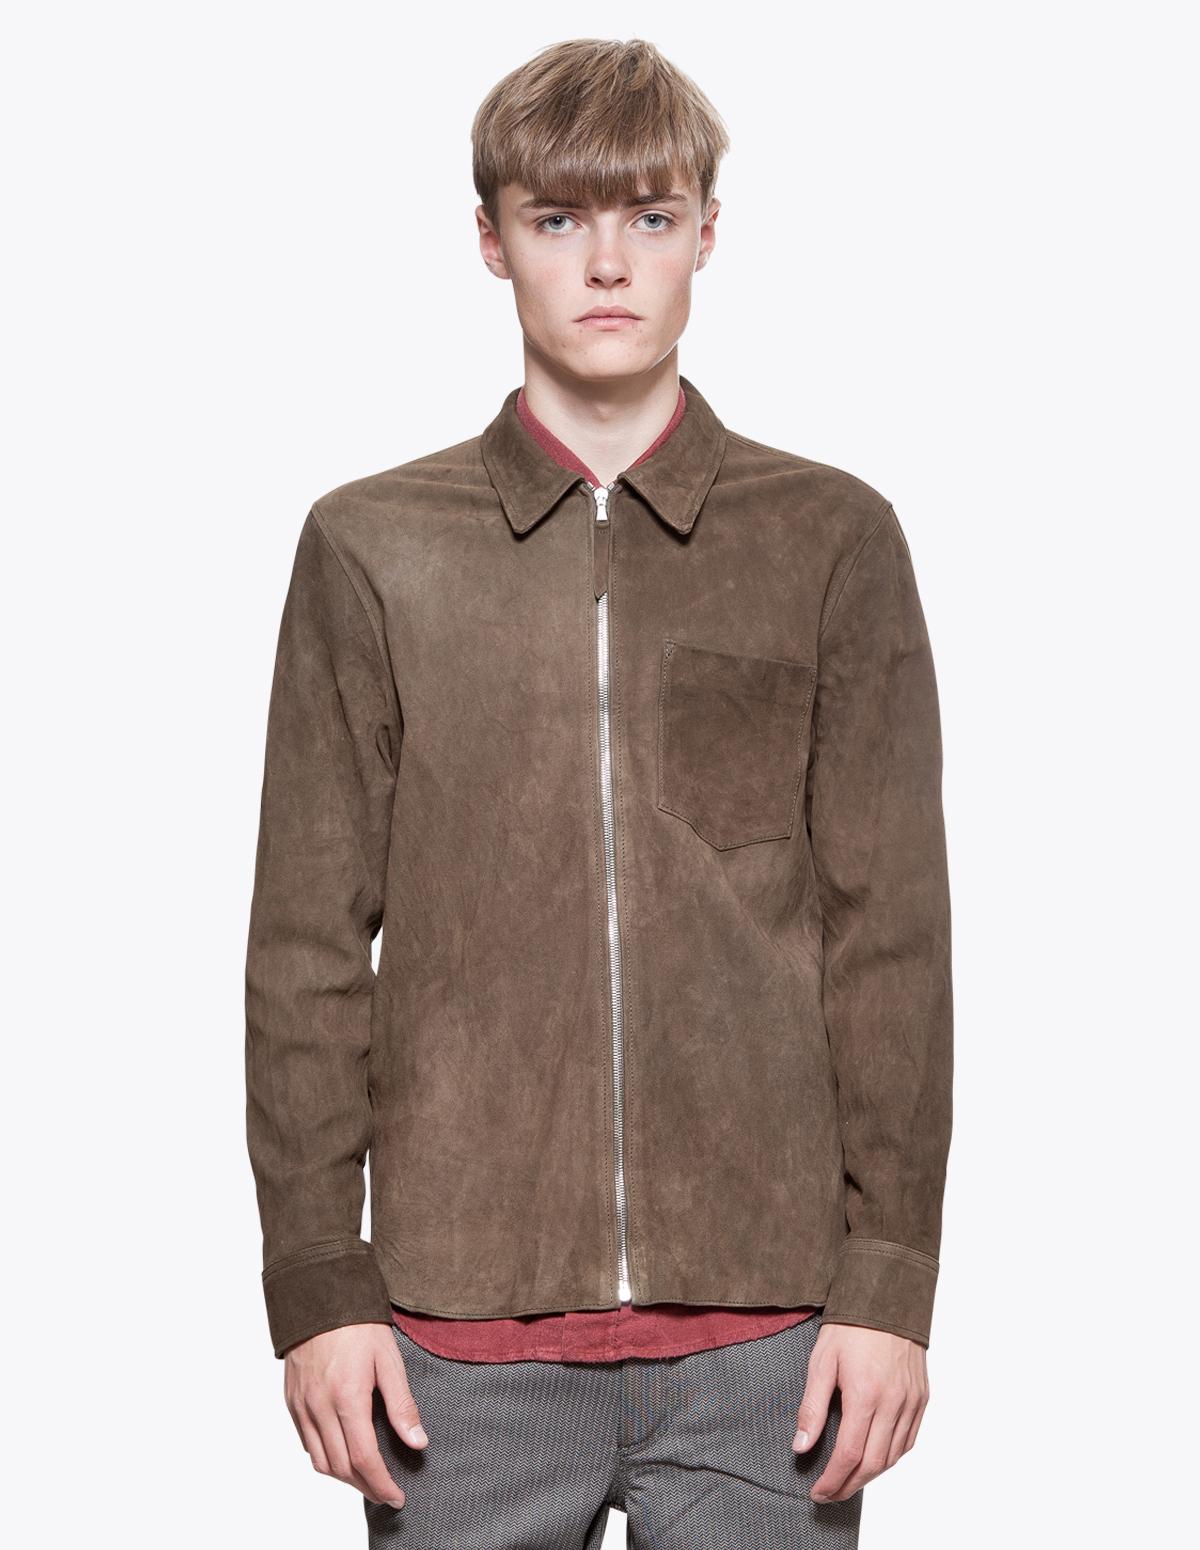 ol-shirt-suade-brown001_1.jpg